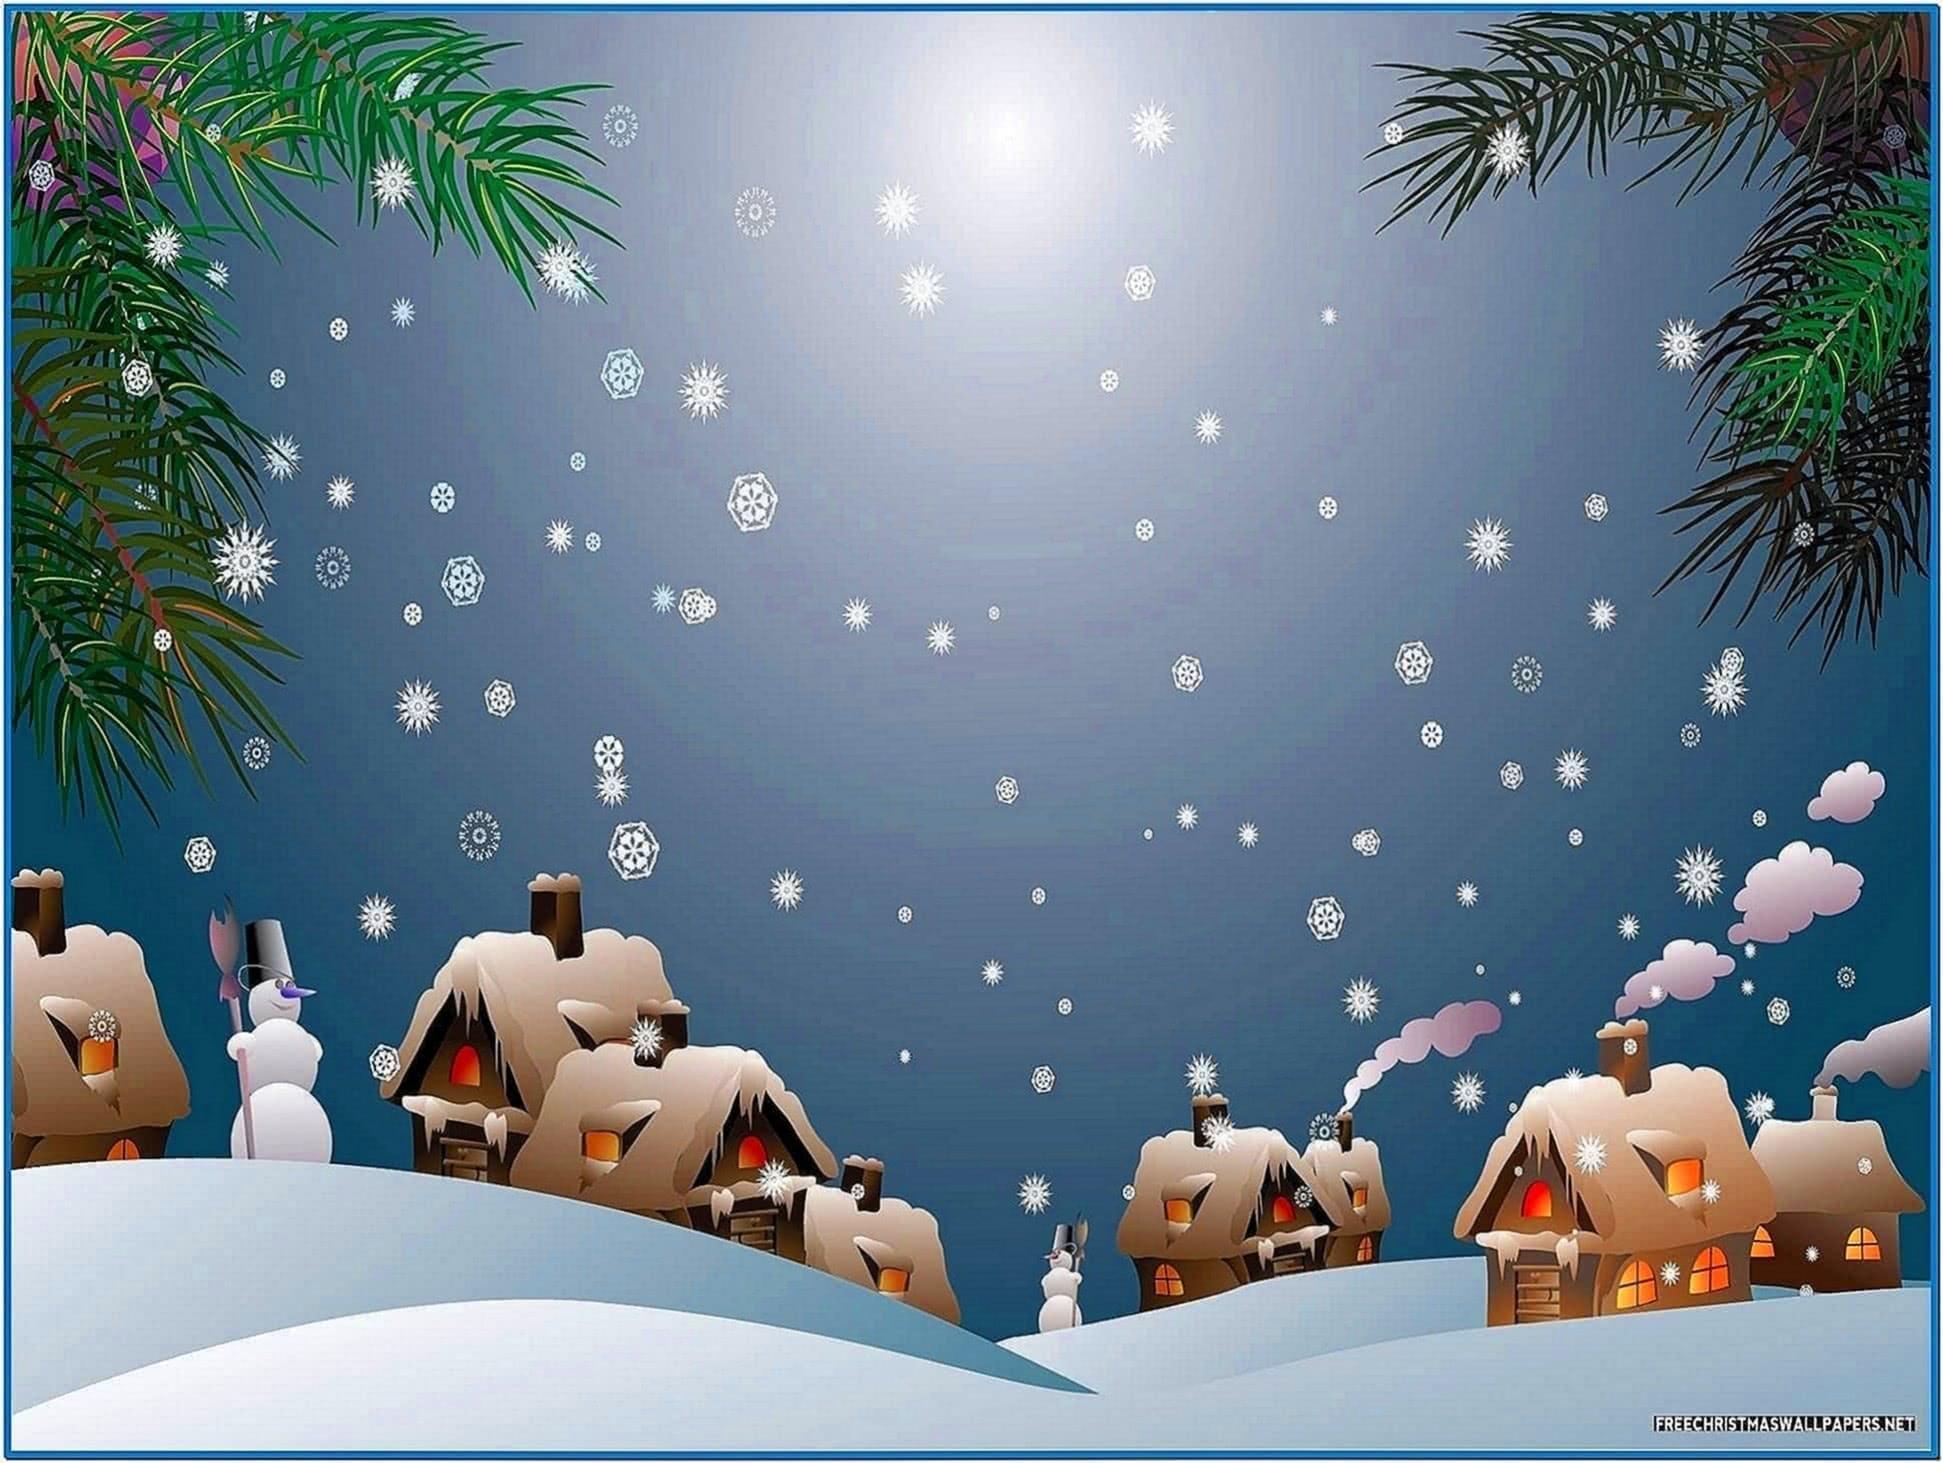 Snowy Christmas Screensaver